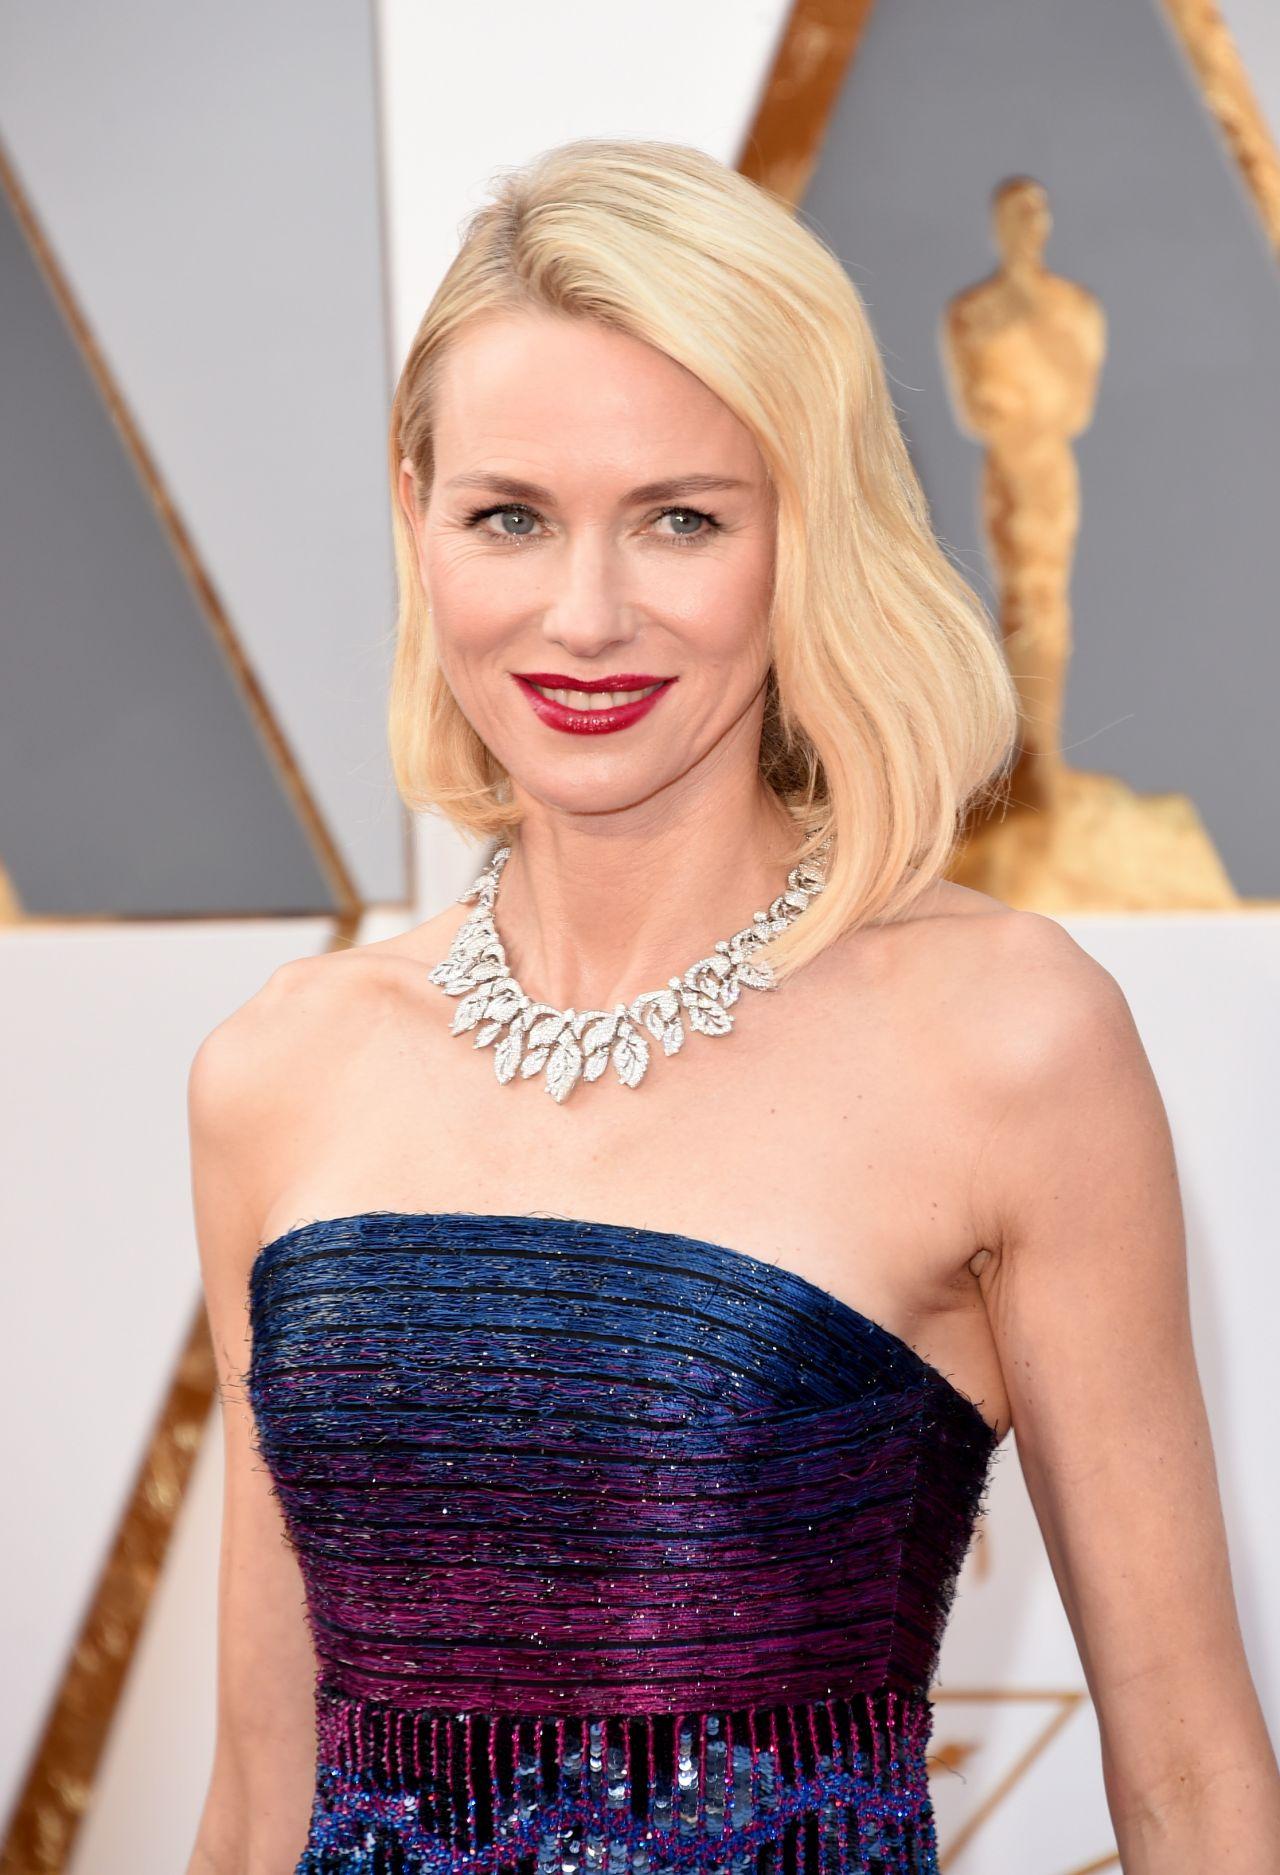 Naomi Watts - Oscars 2016 in Hollywood, CA 2/28/2016 Naomi Watts